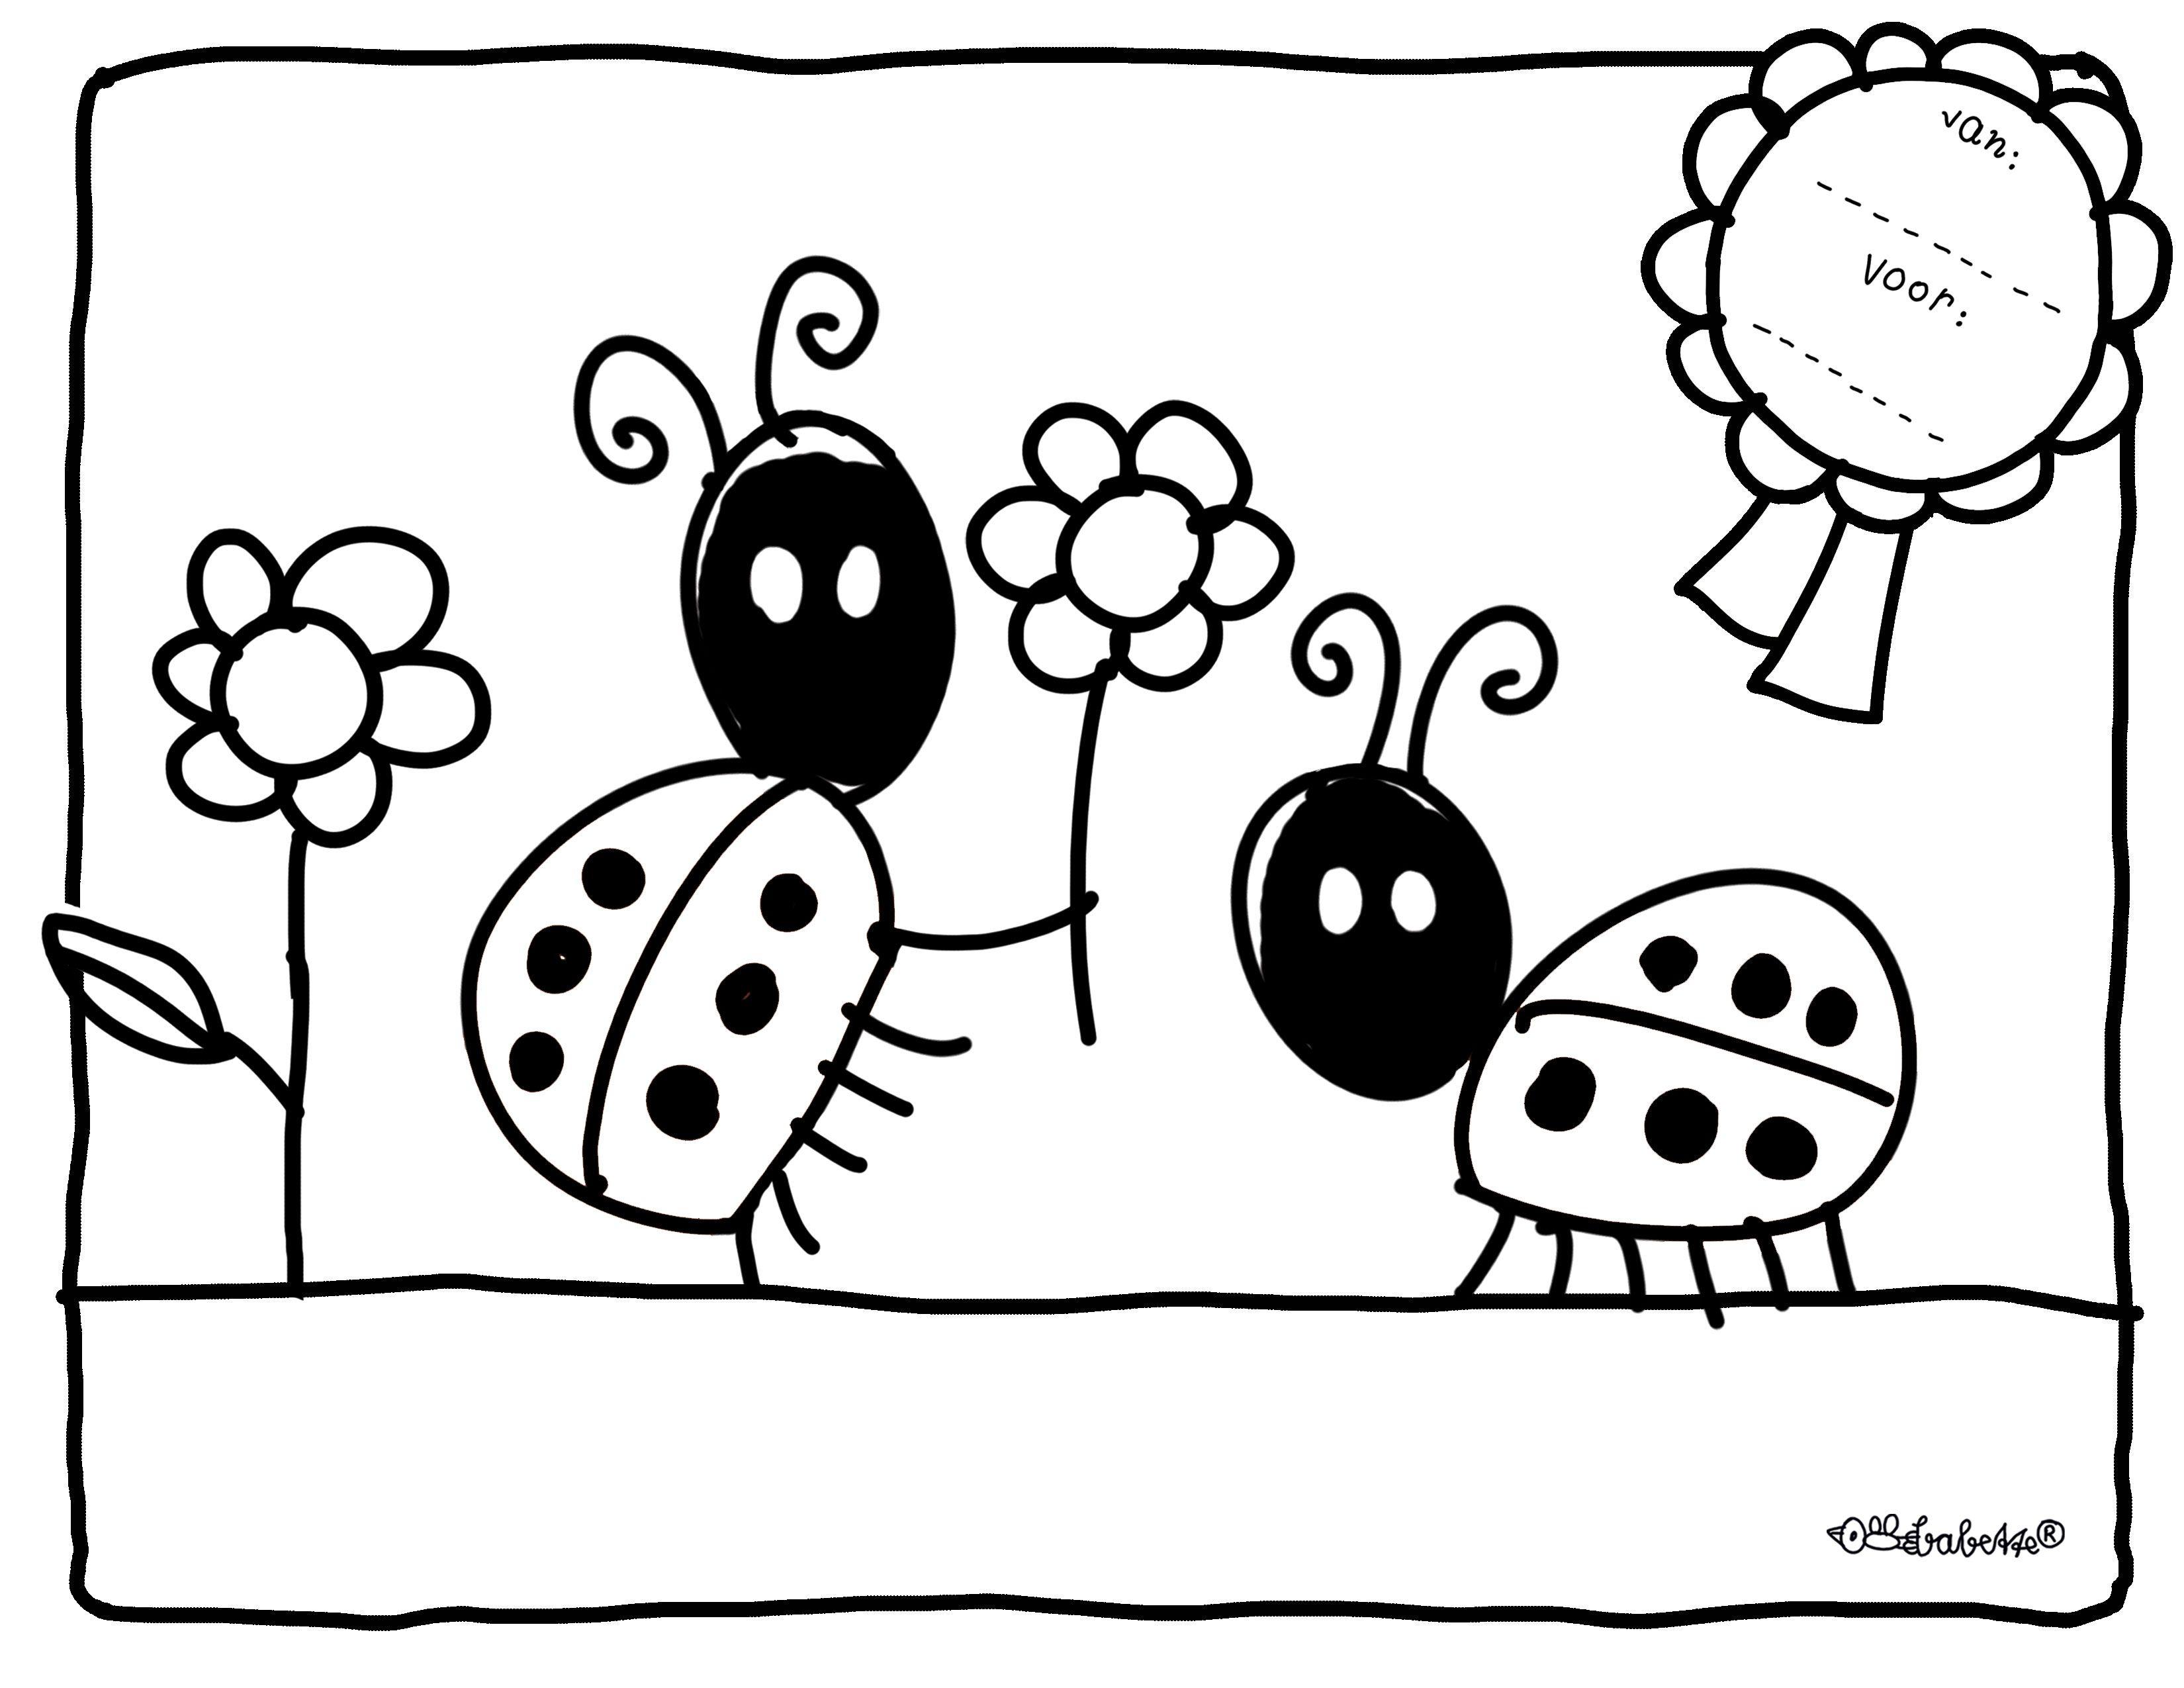 Kleurplaat Liefebees Jpg 3 300 2 550 Pixels Kleurplaten Lieveheersbeestje Knutselen Lieveheersbeestje